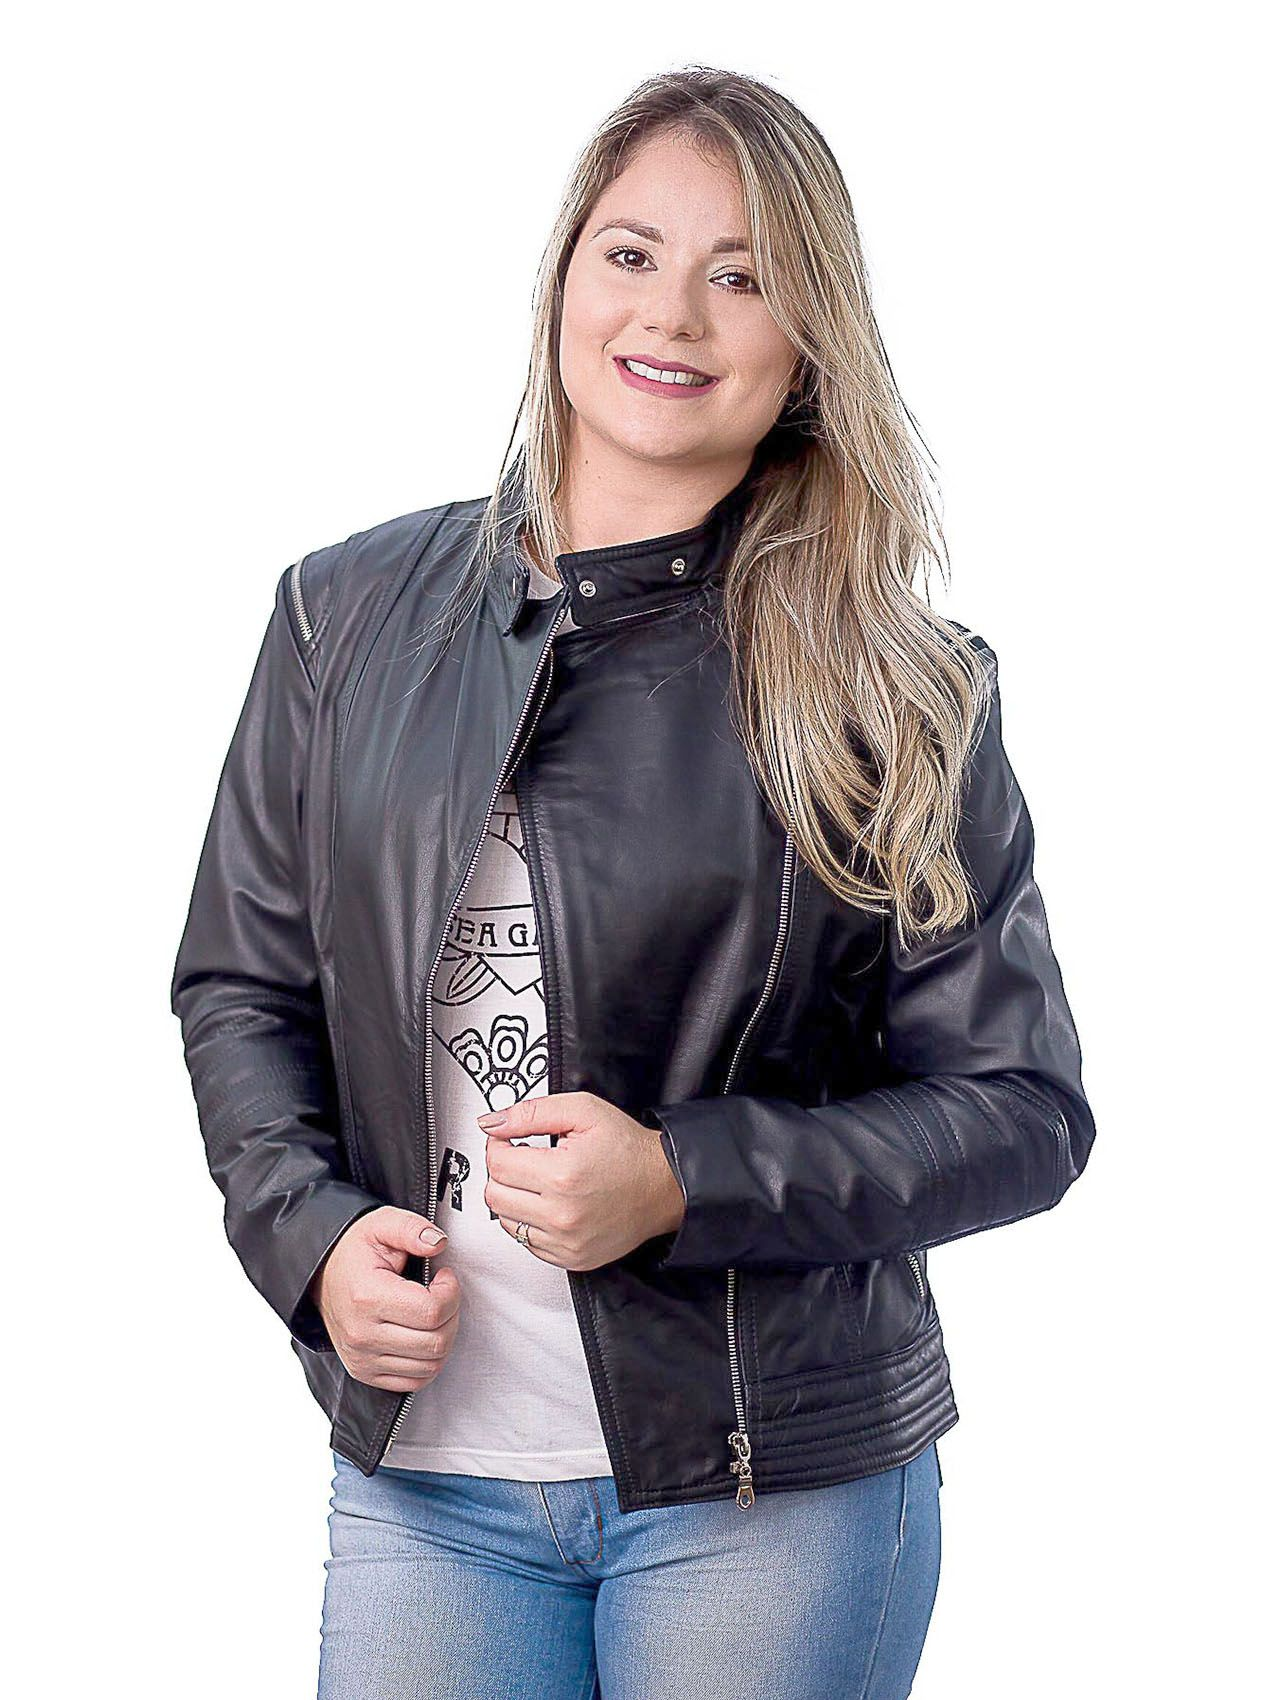 Jaqueta Feminina 200 Prata Couro Preto